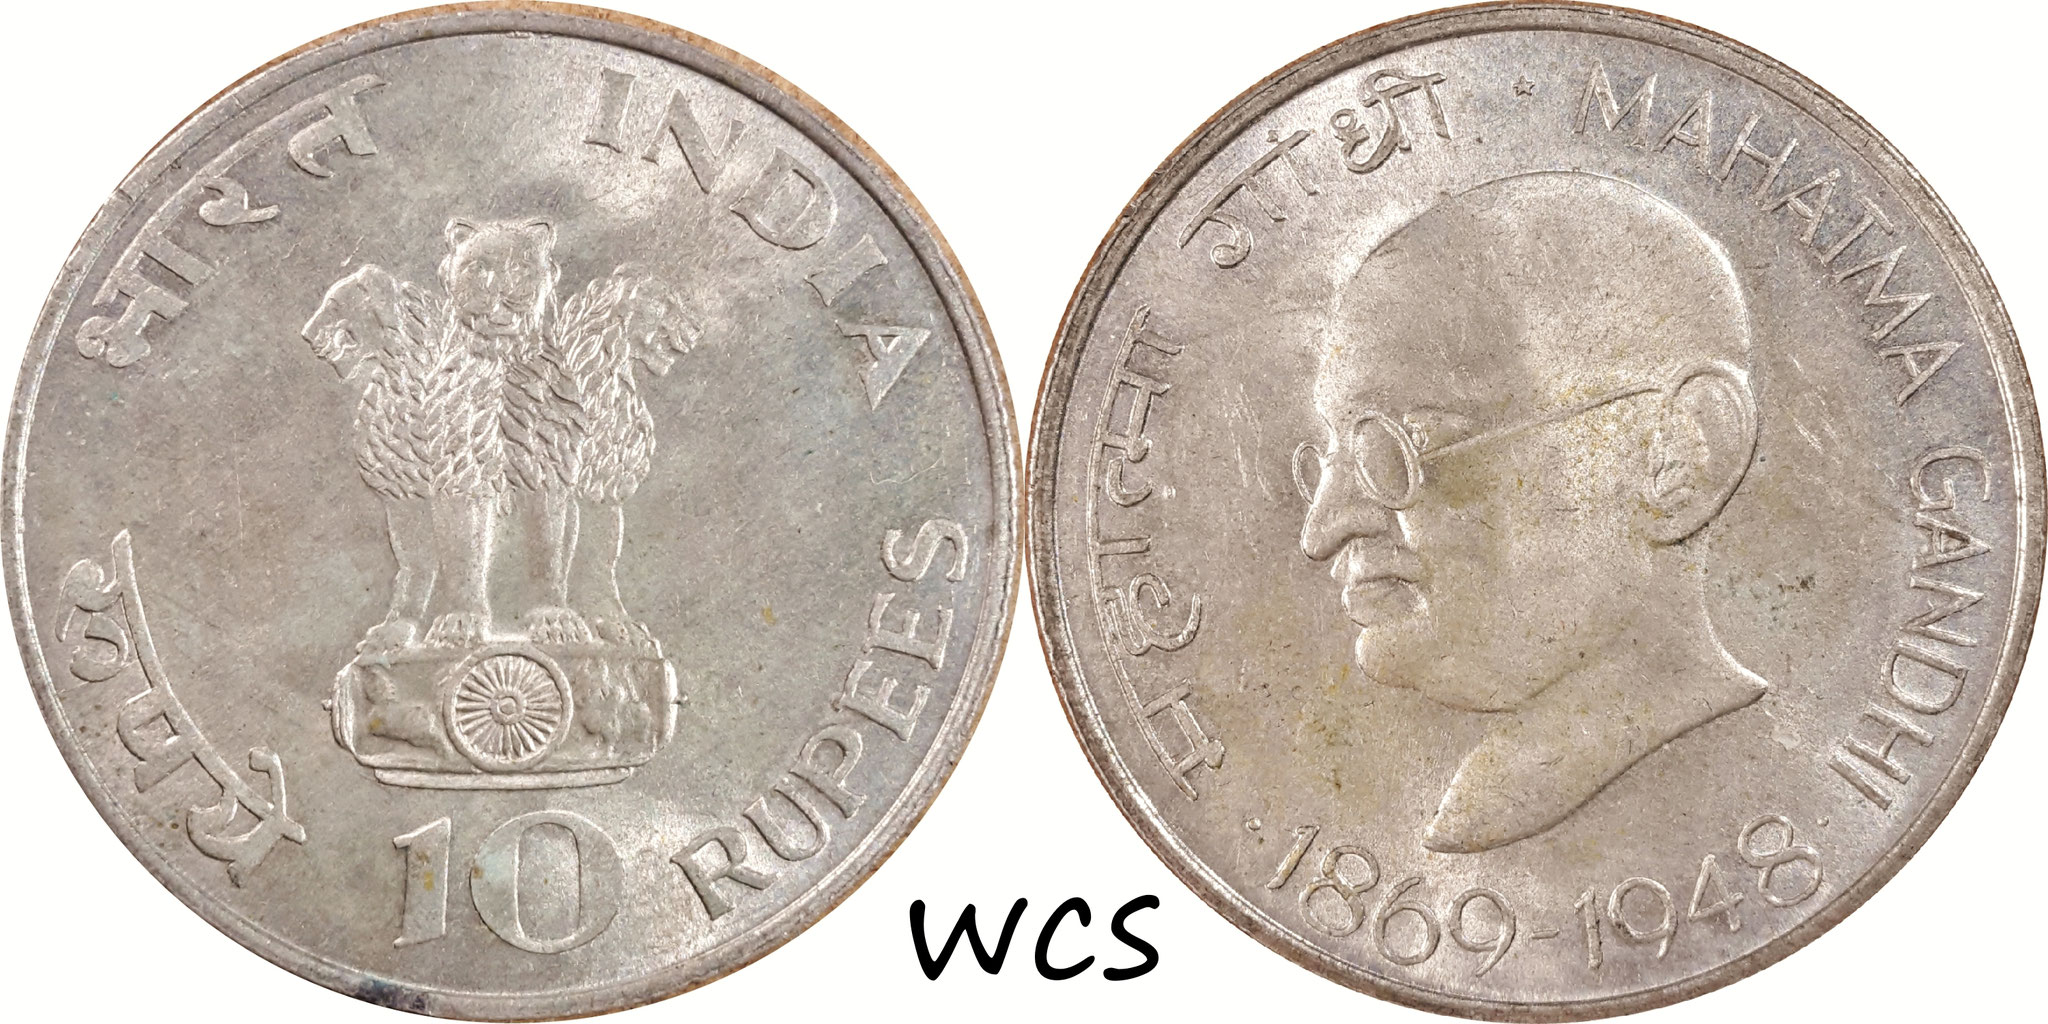 India 10 Rupees 1969 - Mahatma Gandhi, Calcutta Mint